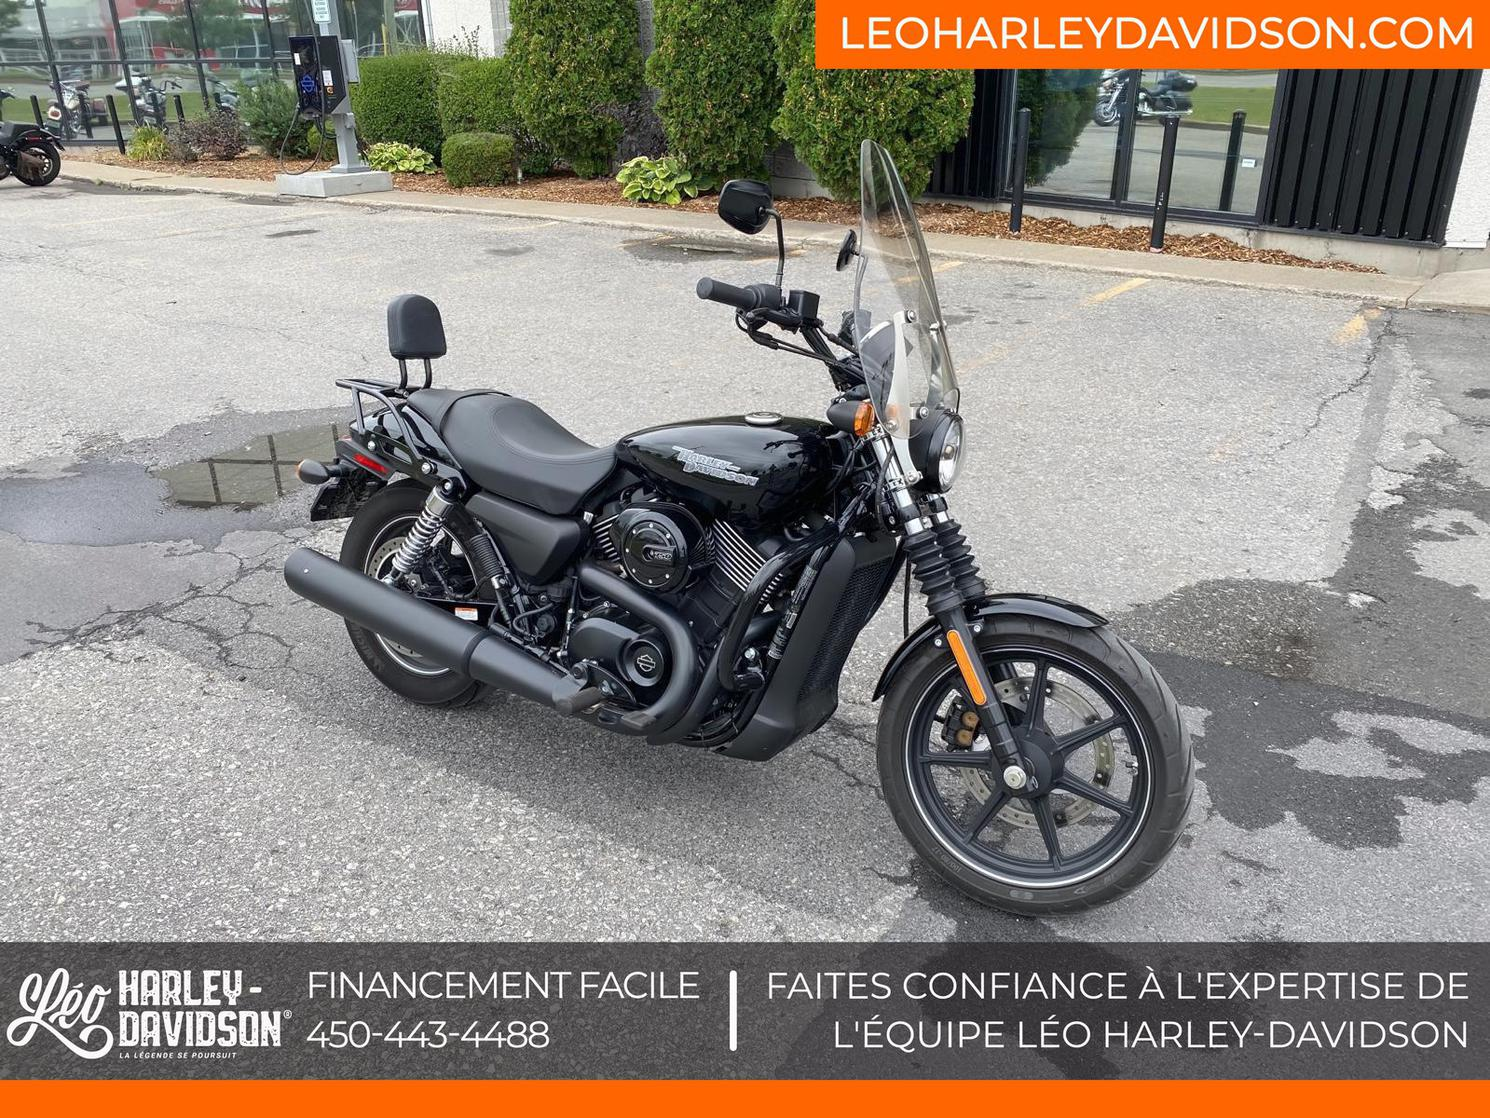 2018 Harley-Davidson XG750 STREET 750